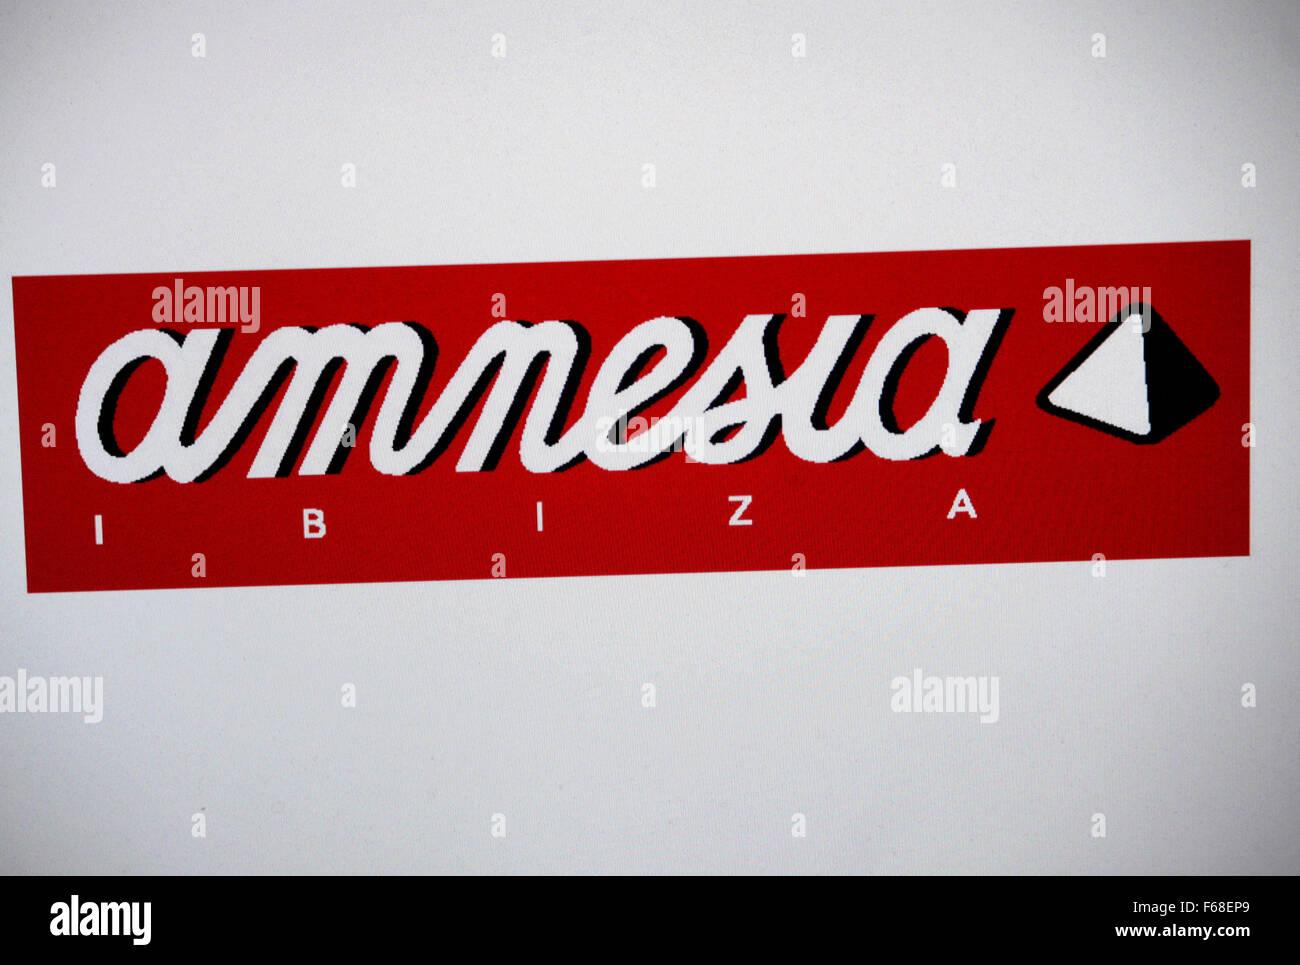 Markenname: 'Amnesia Ibiza', Berlin. - Stock Image